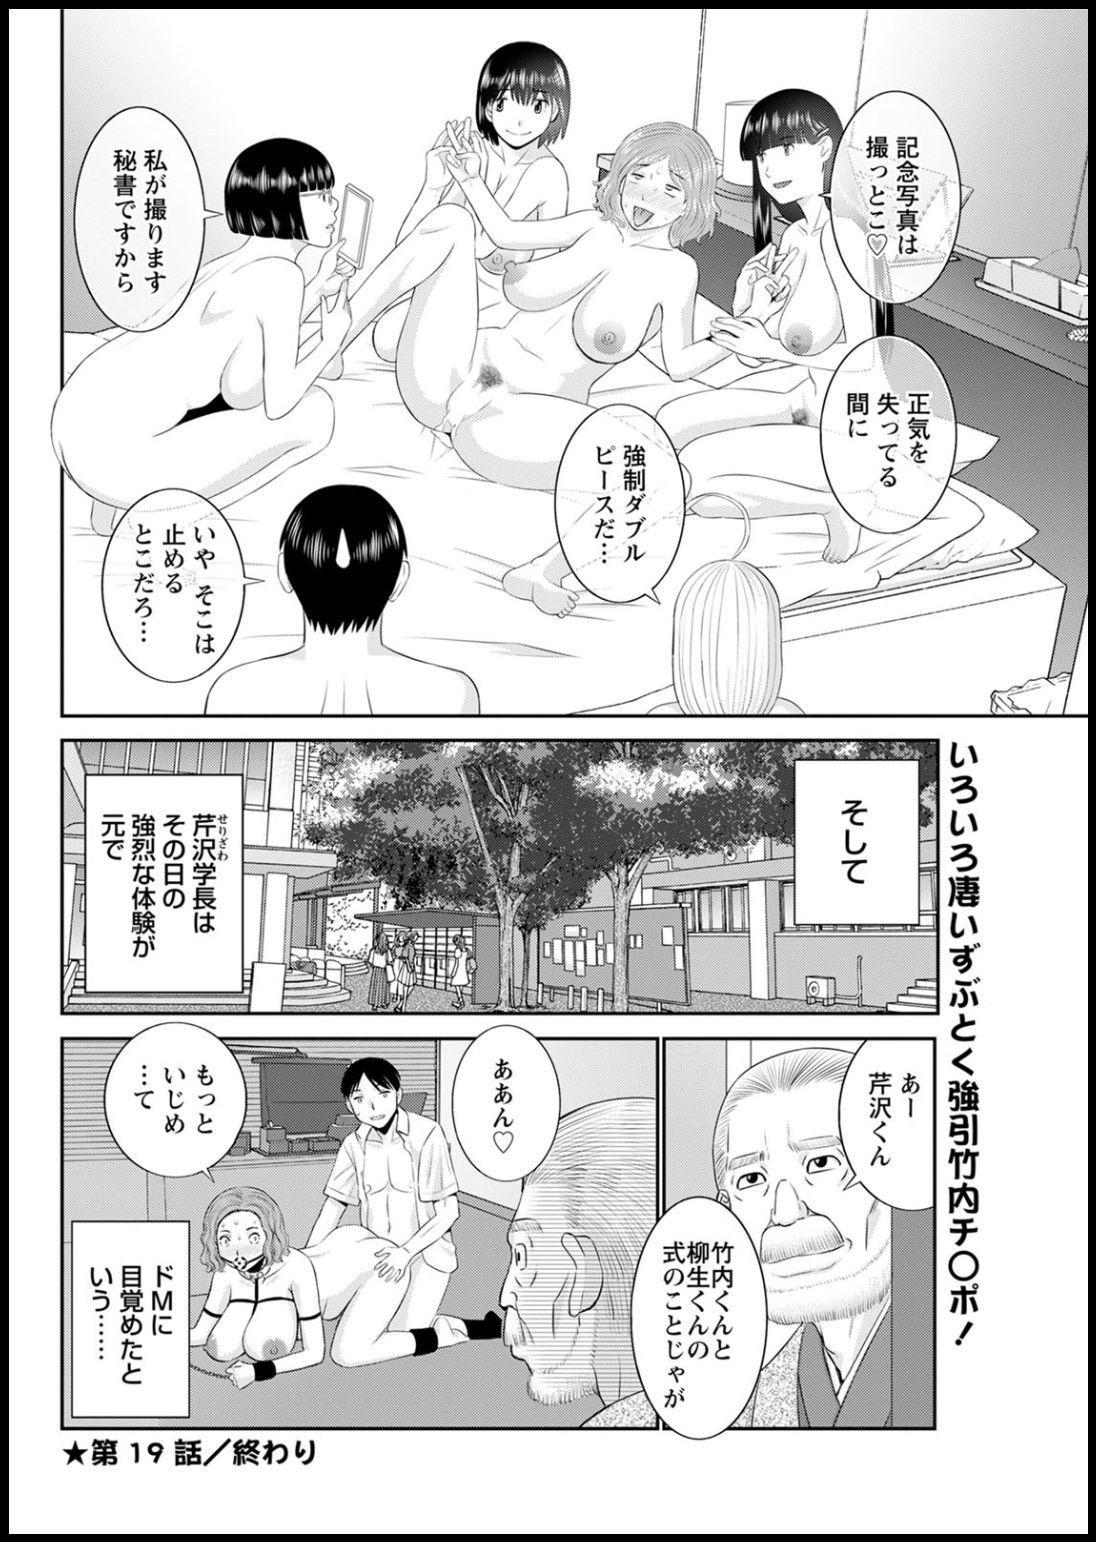 [Kawamori Misaki] Kaikan Hitotsuma Gakuen Ch. 1-6, 8-20 [Digital] 332